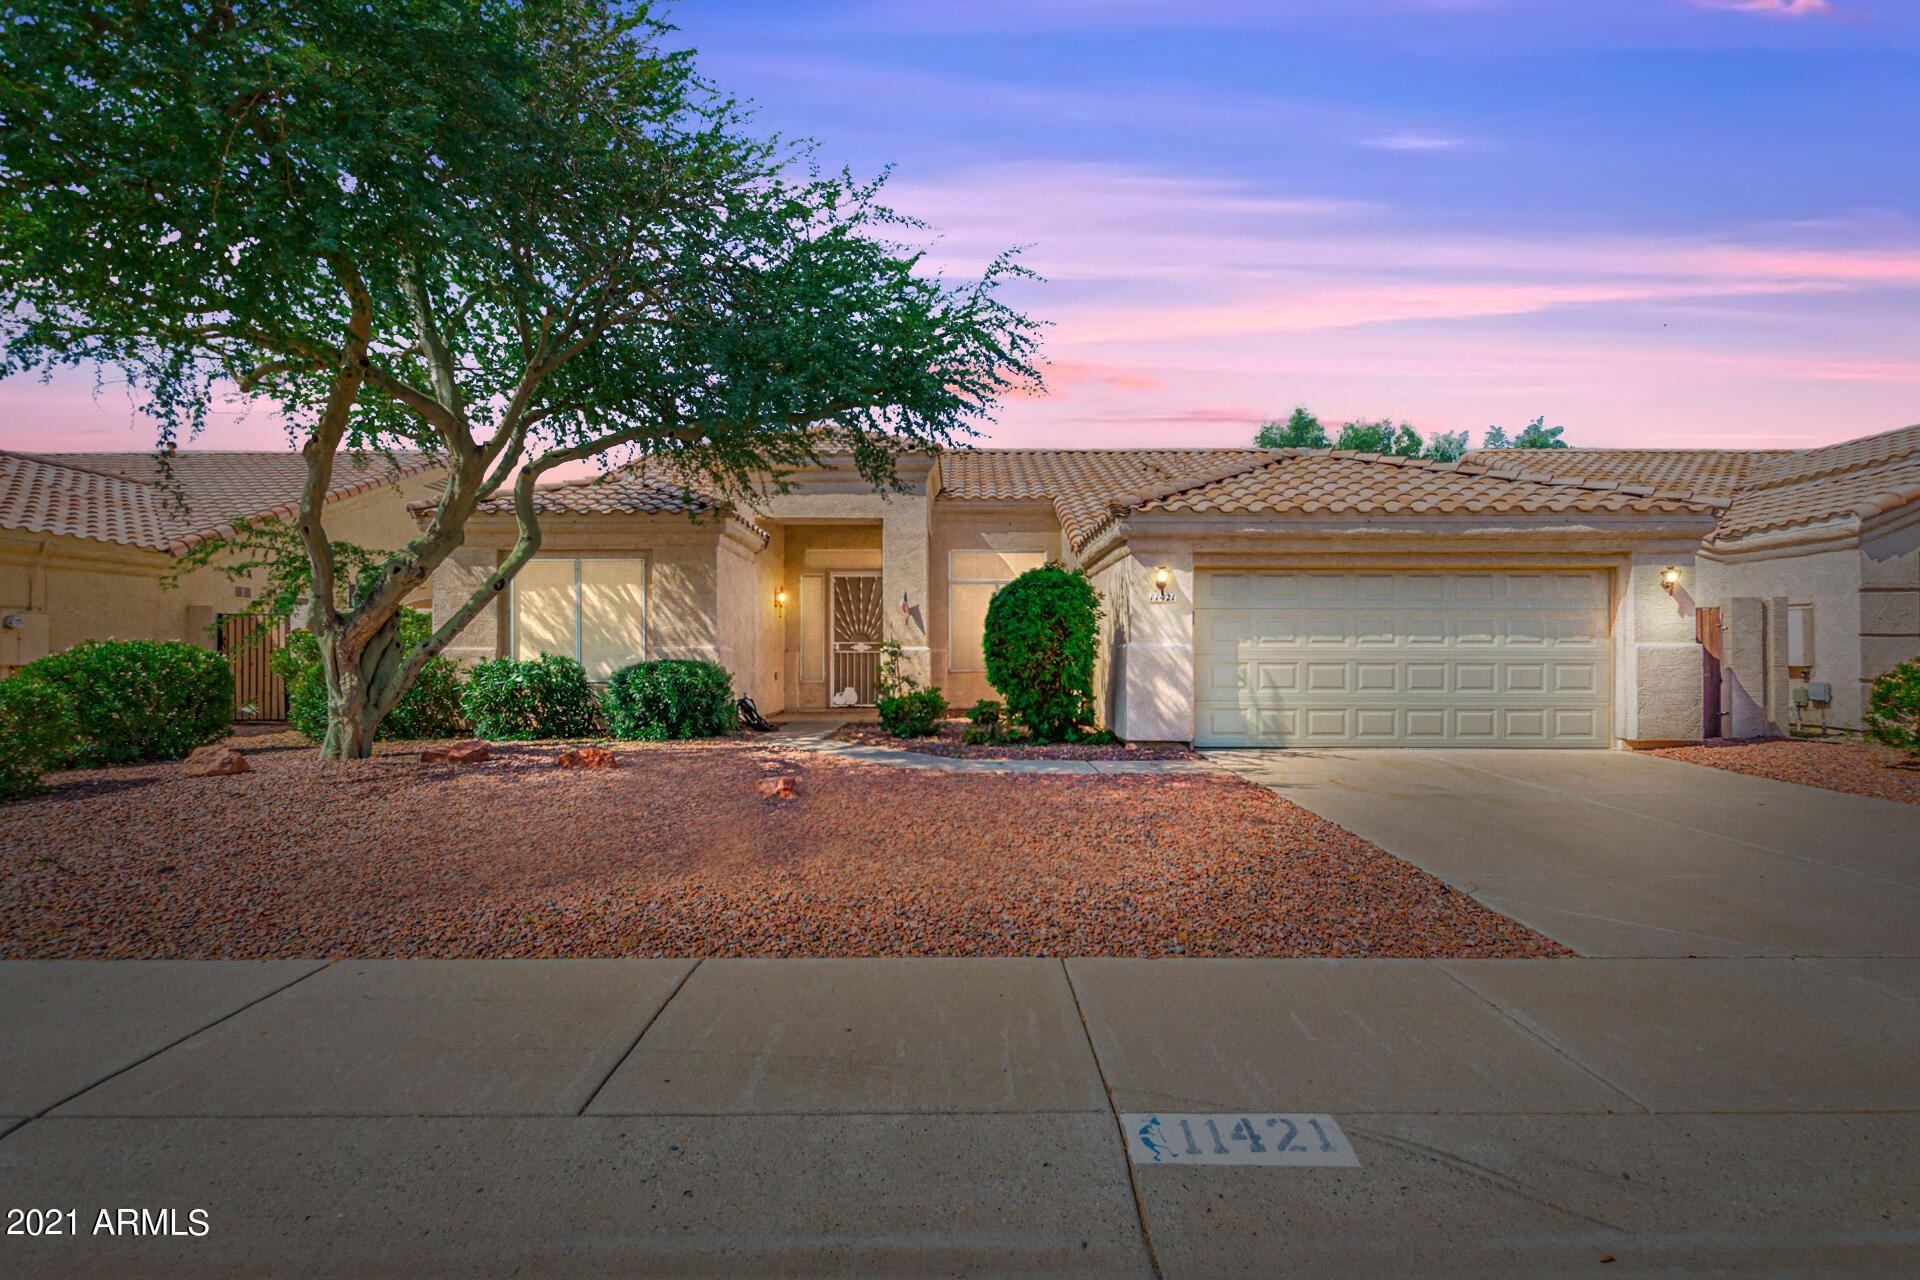 Photo of 11421 W LAURELWOOD Lane, Avondale, AZ 85392 (MLS # 6294311)